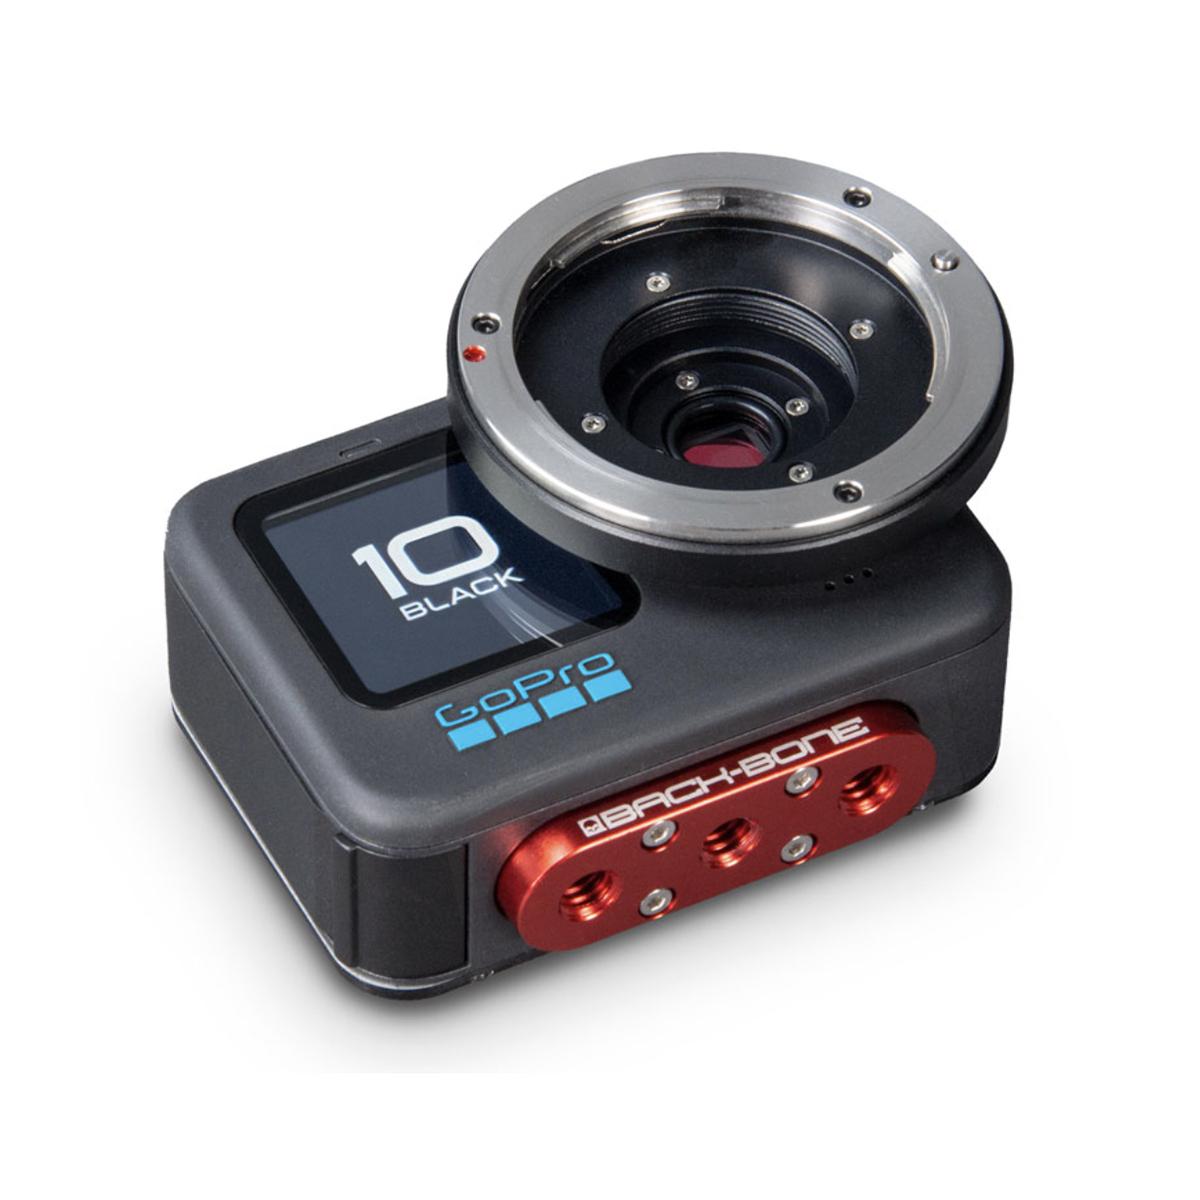 Back-Bone H10PRO Camera showing MFT lens mount and tripod mount